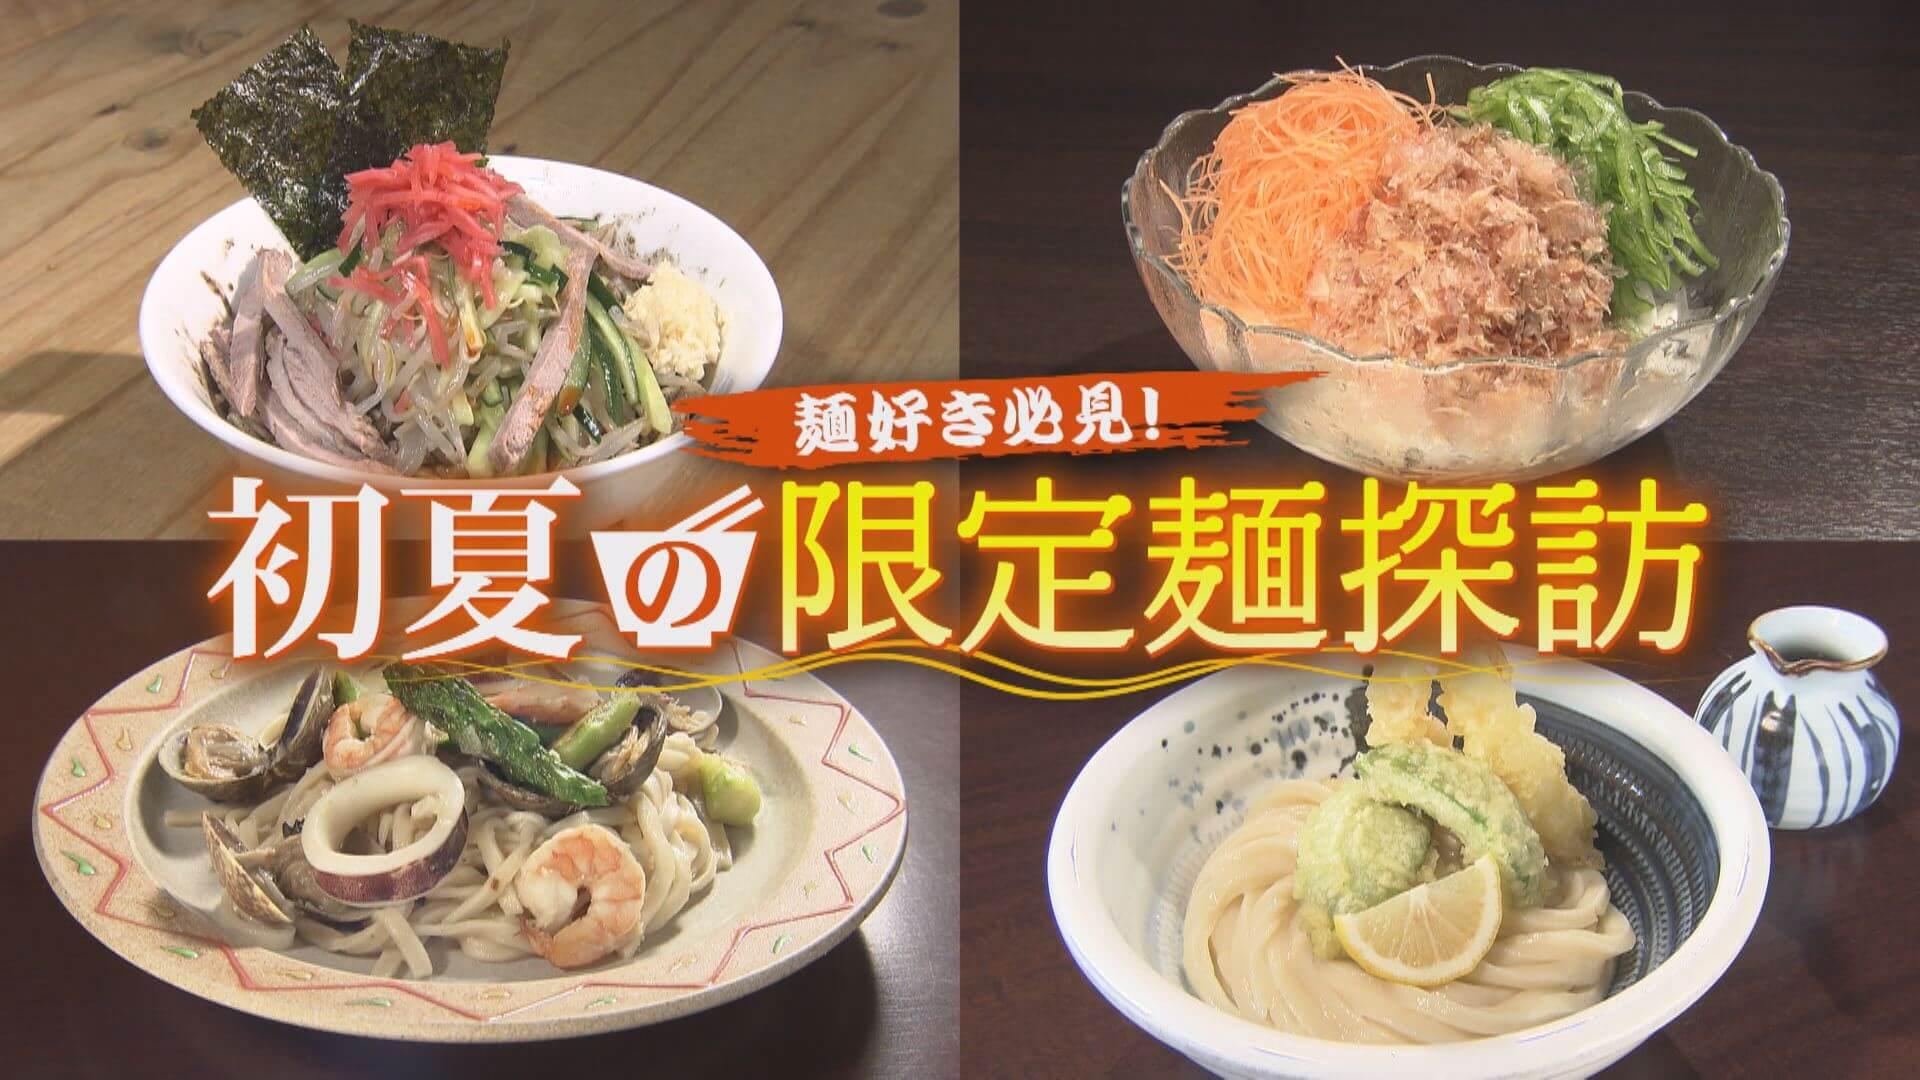 麺好き必見!初夏の限定麺探訪